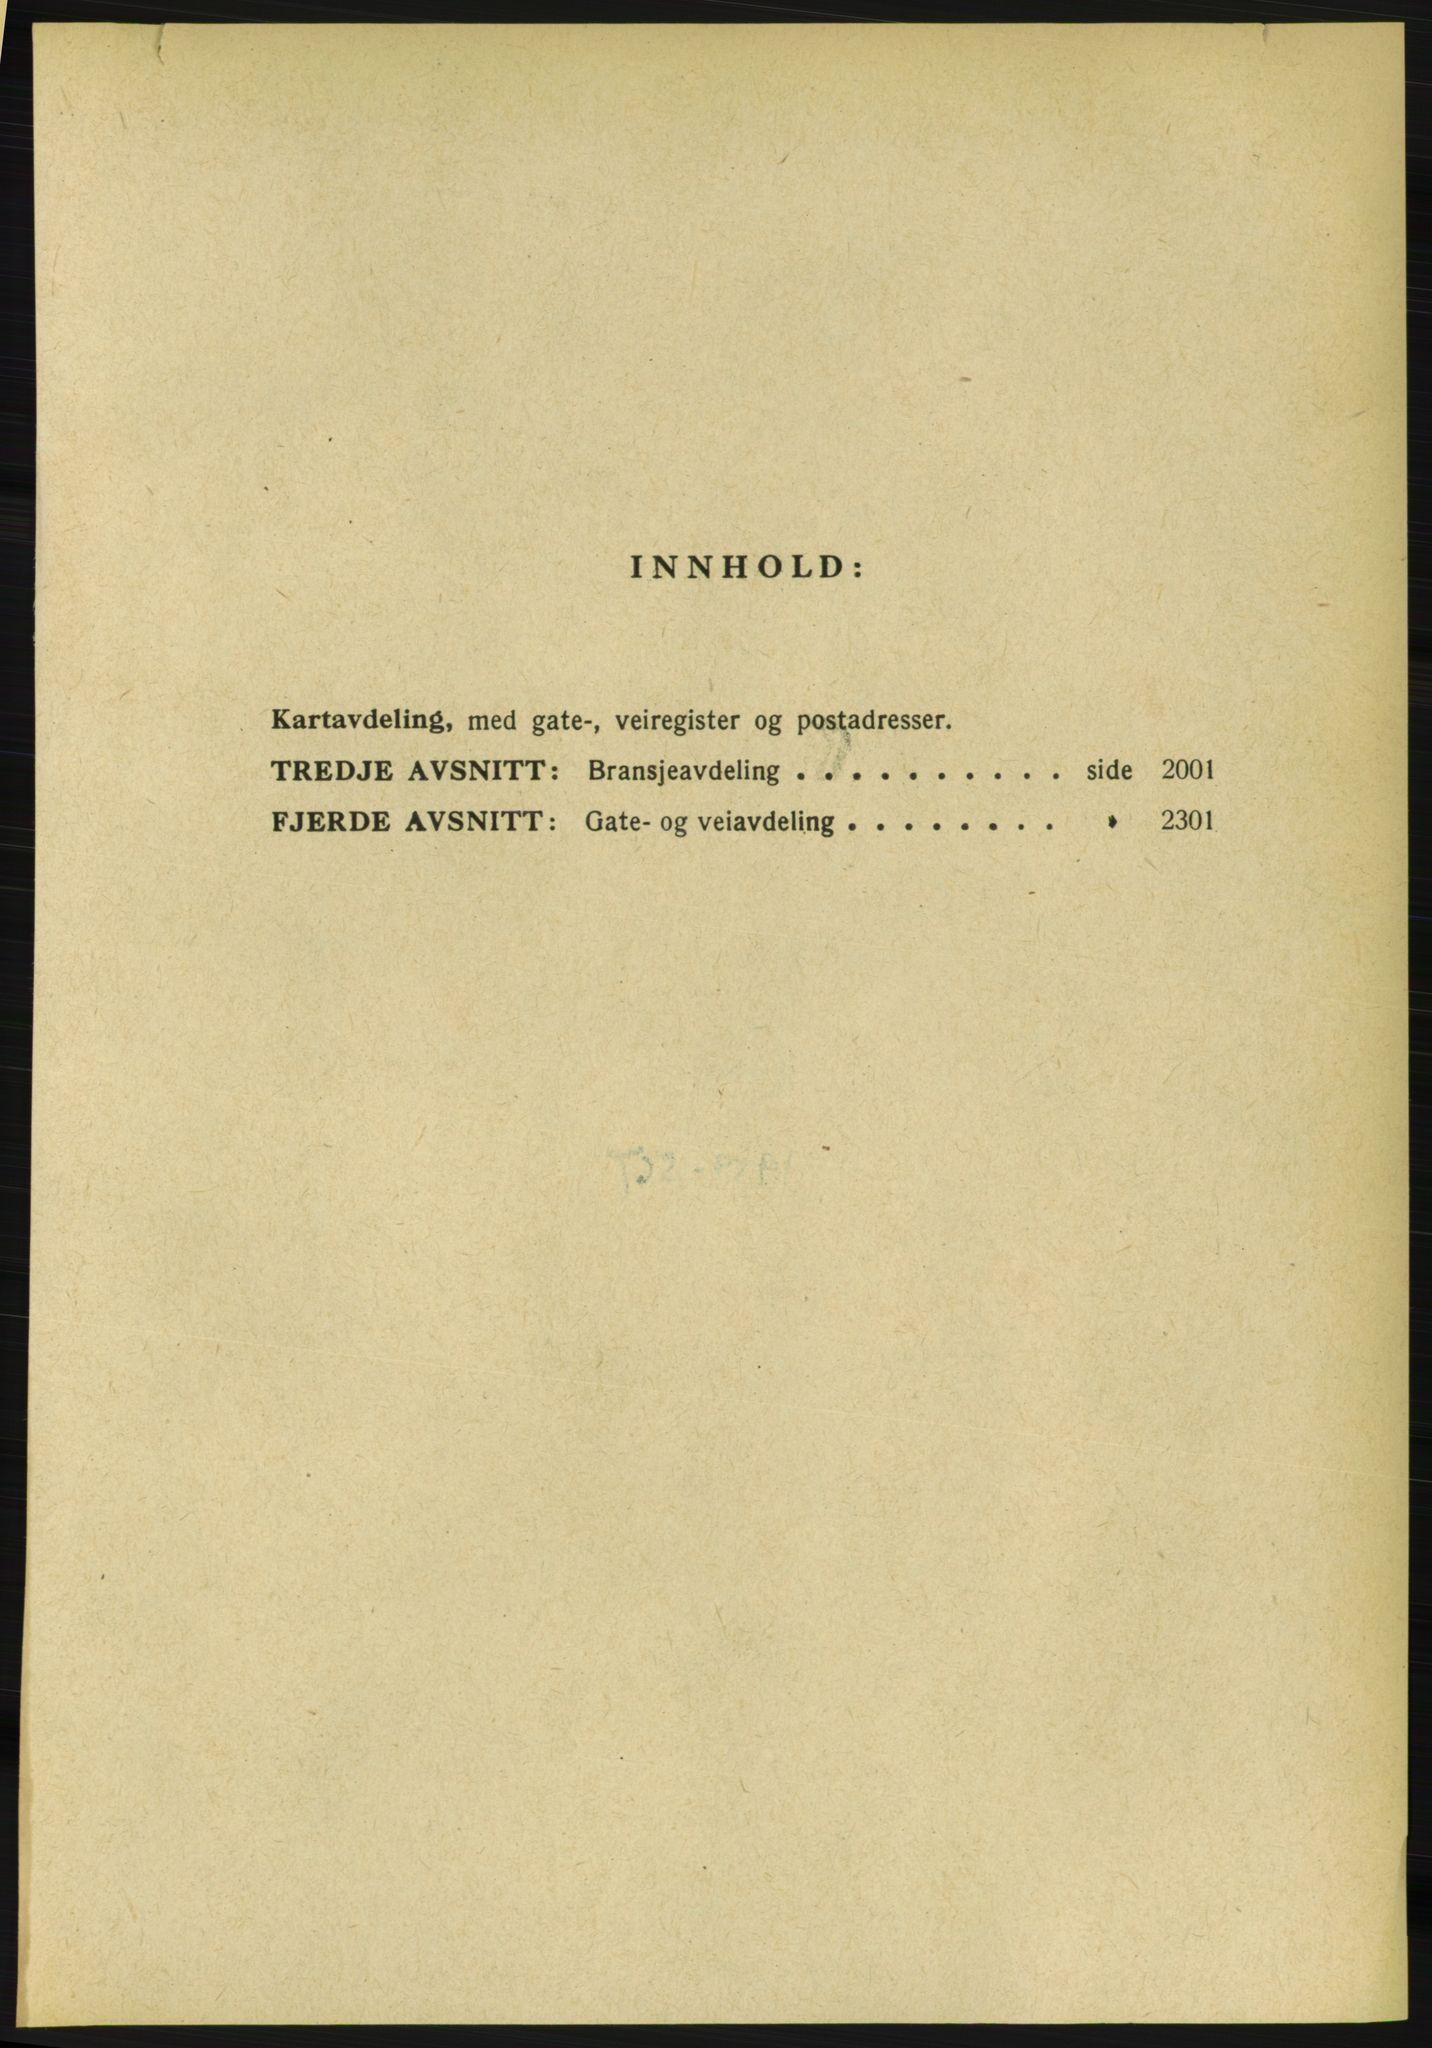 PUBL, Kristiania/Oslo adressebok, 1959-1960